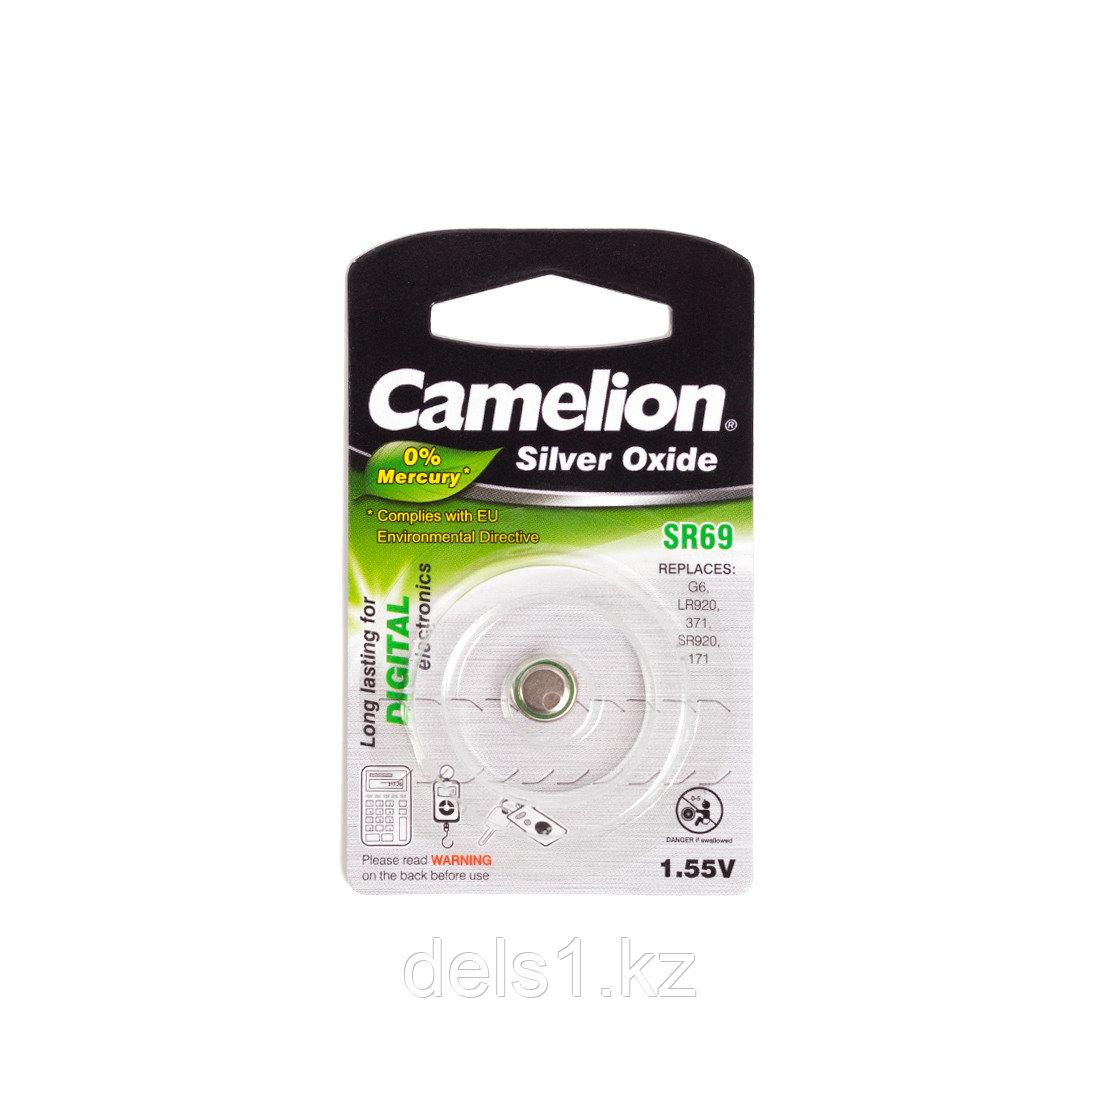 Батарейка, CAMELION, SR69-BP1(0%Hg) , Silver Oxide, 1.55V, 0% Ртути, 1 шт., Блистер